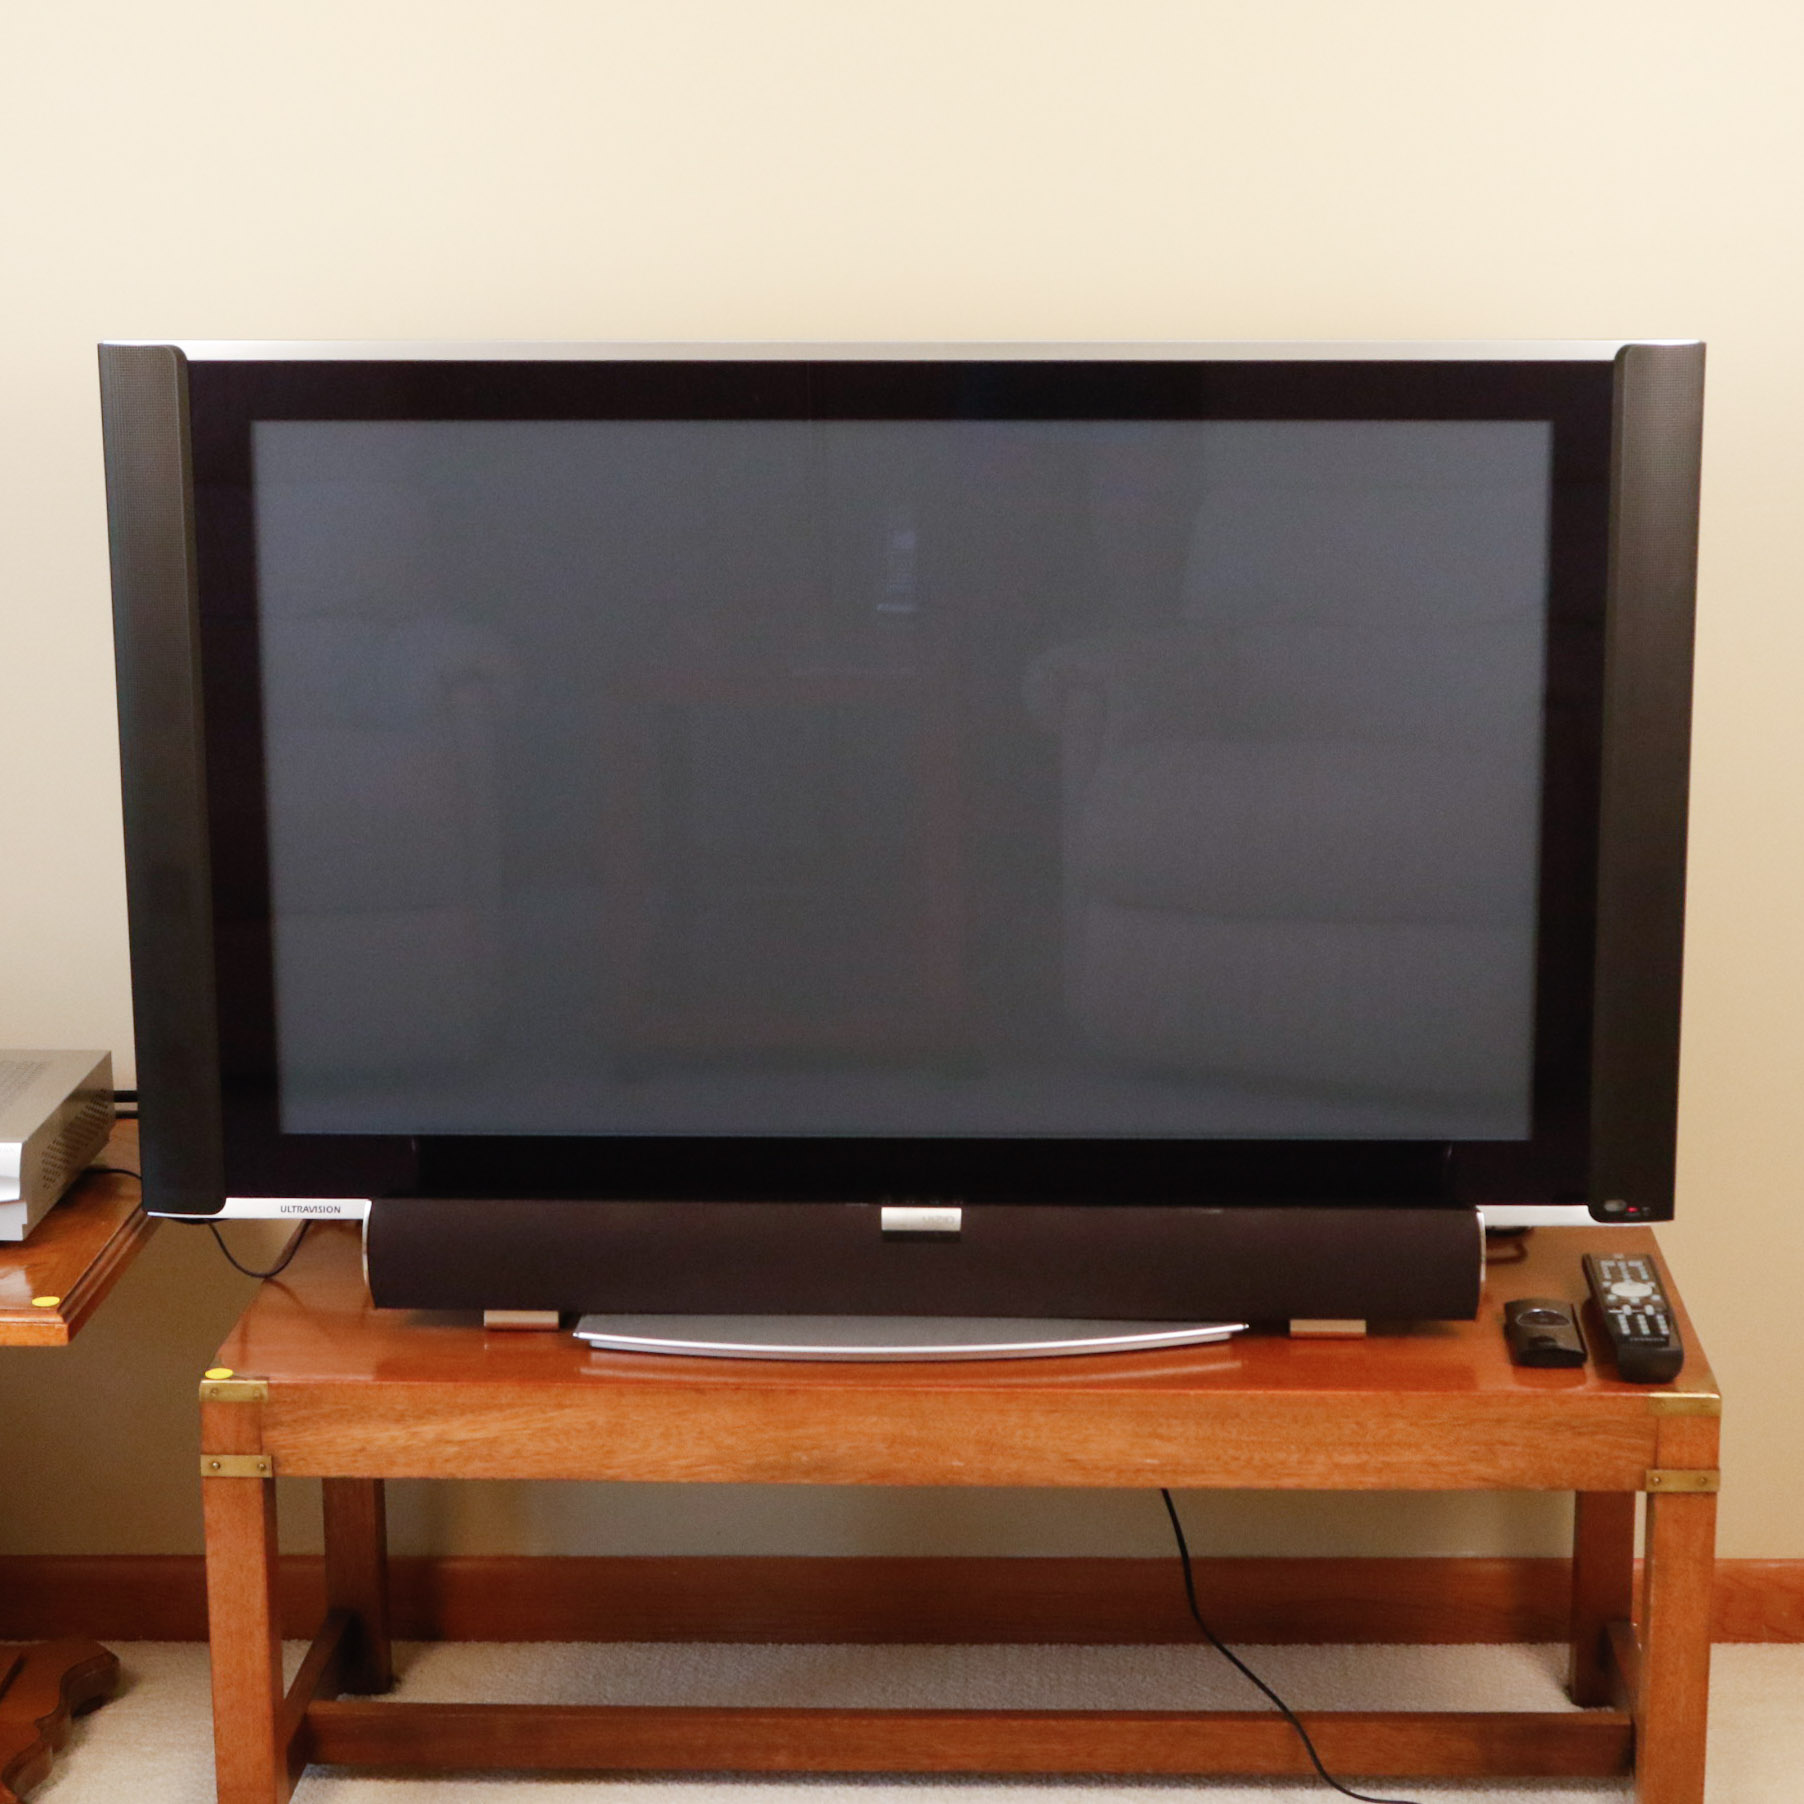 hitachi plasma tv. hitachi ultravision 42\ plasma tv u